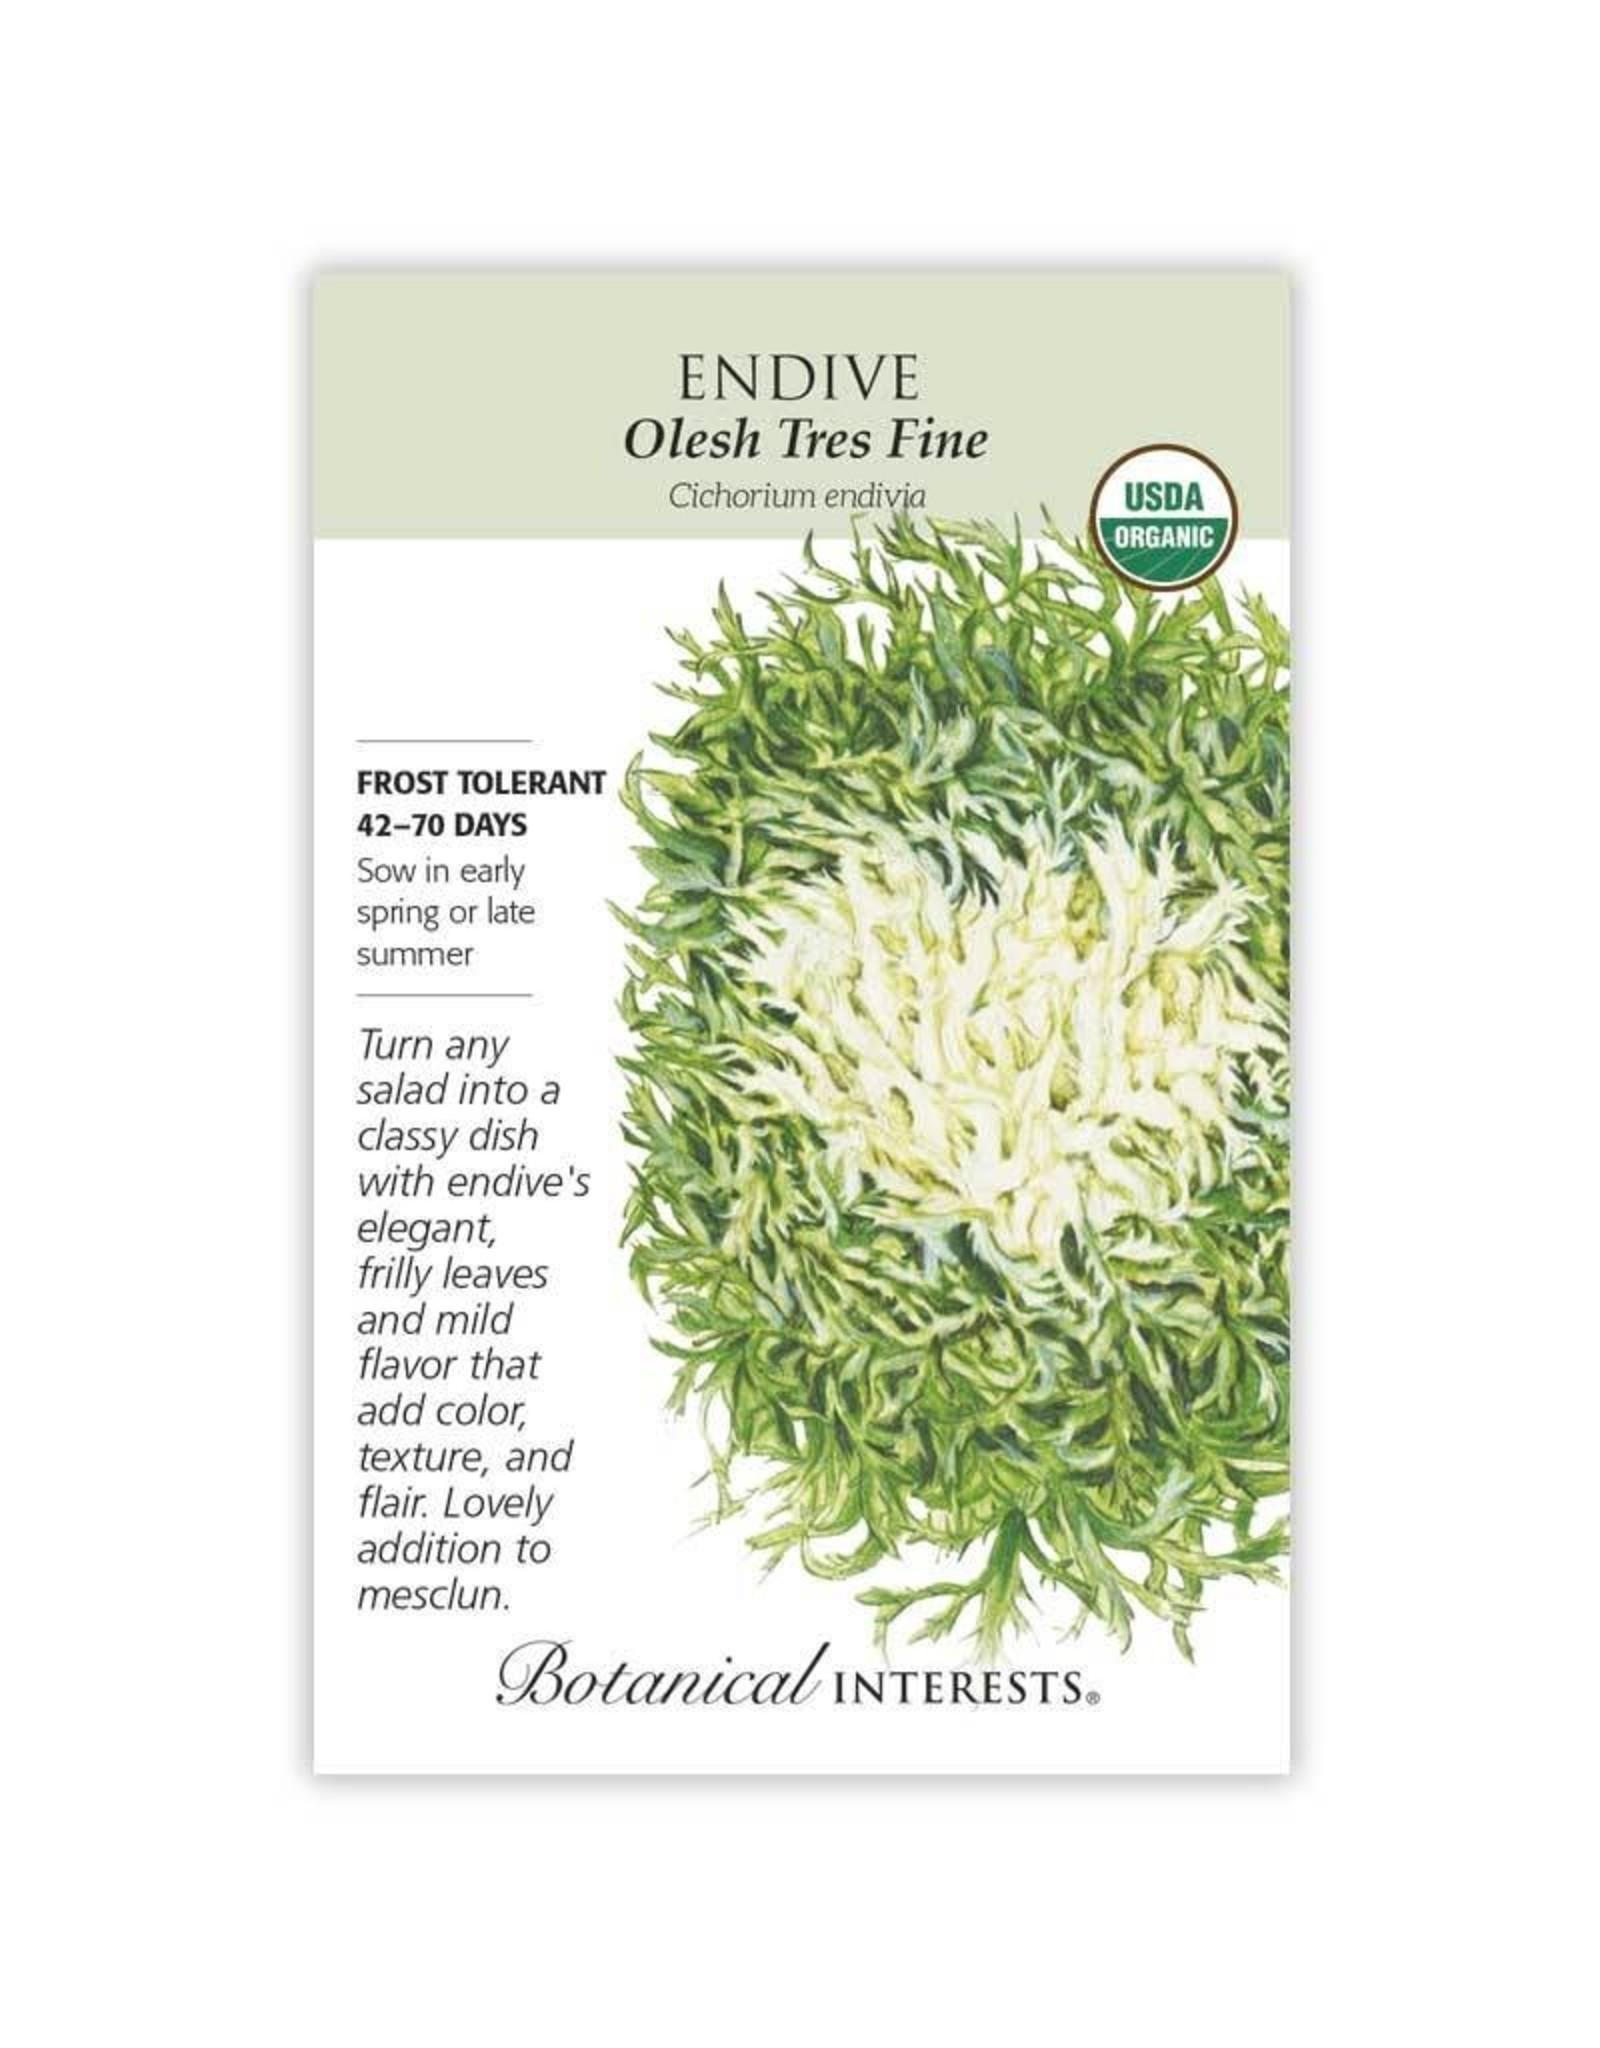 Seeds - Endive Olesh Tres Fine Org